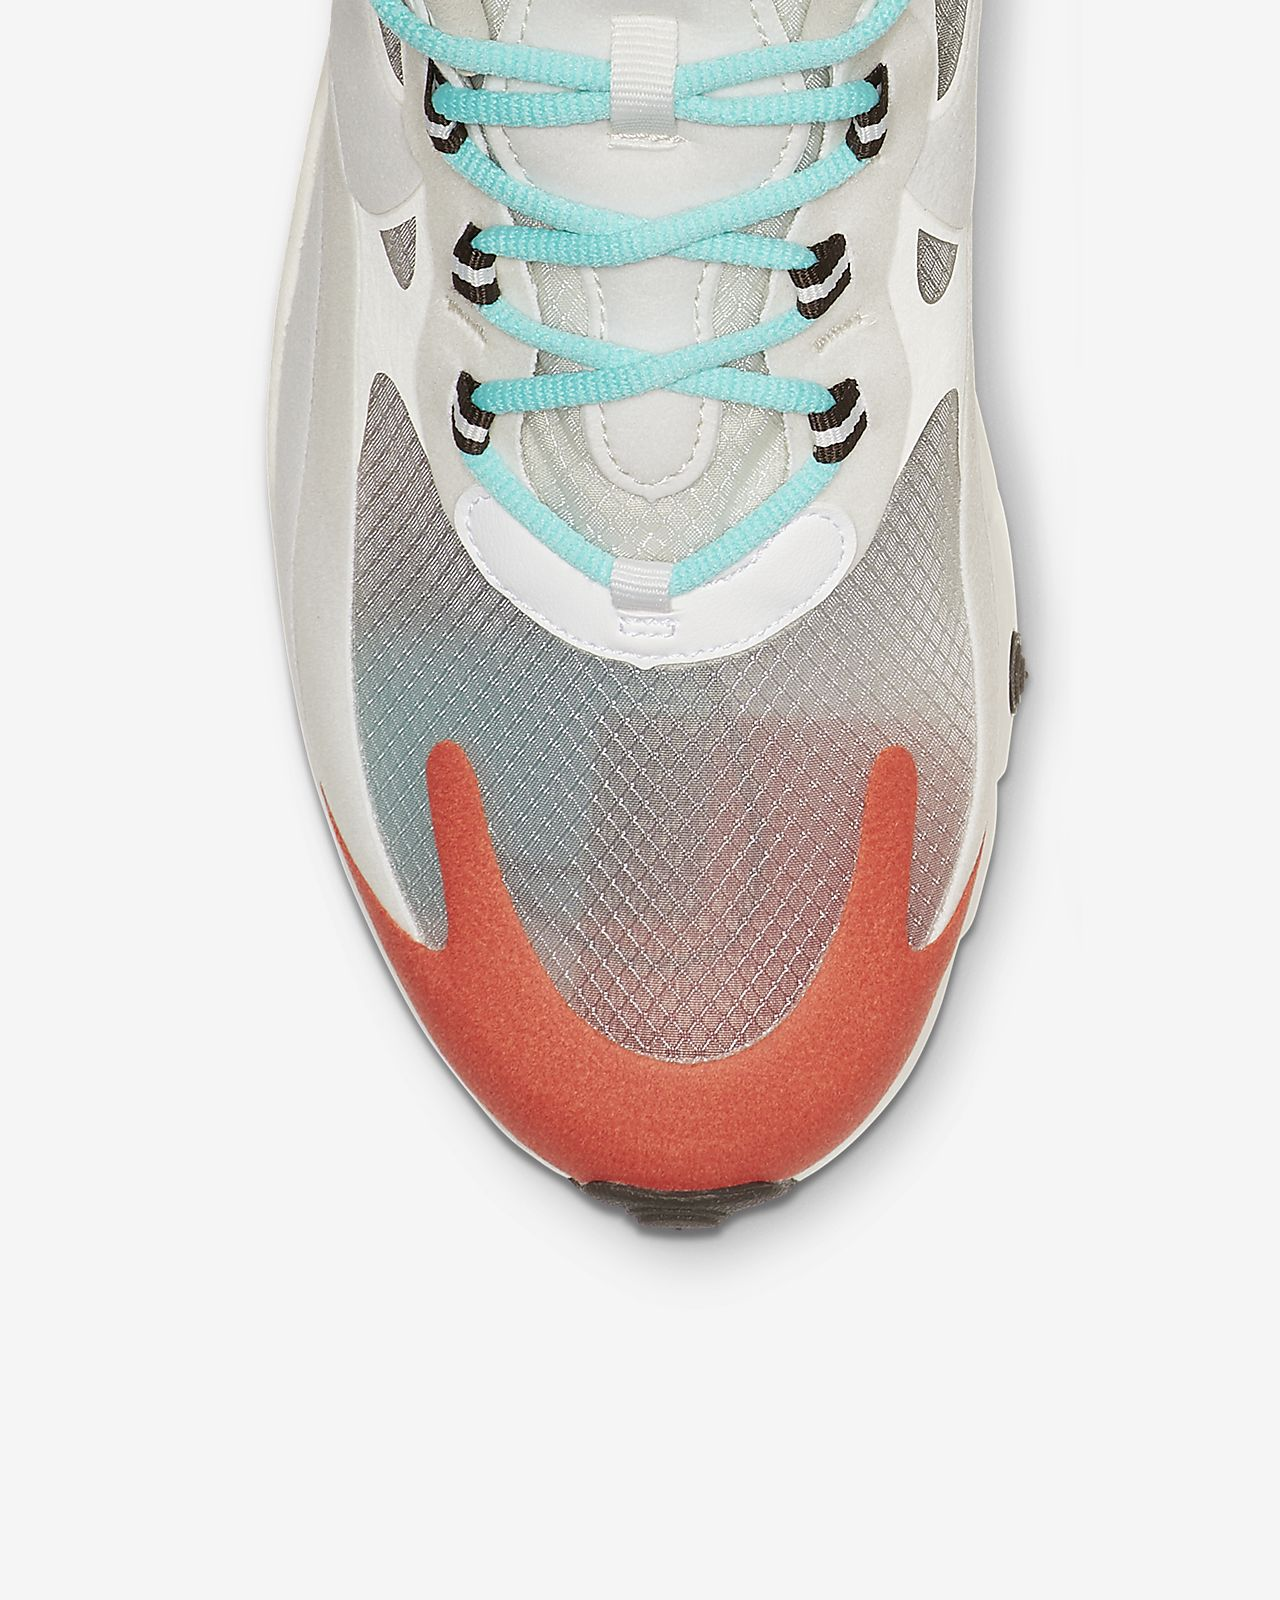 607116db61 Scarpa Nike Air Max 270 React (Mid-Century Art) - Uomo